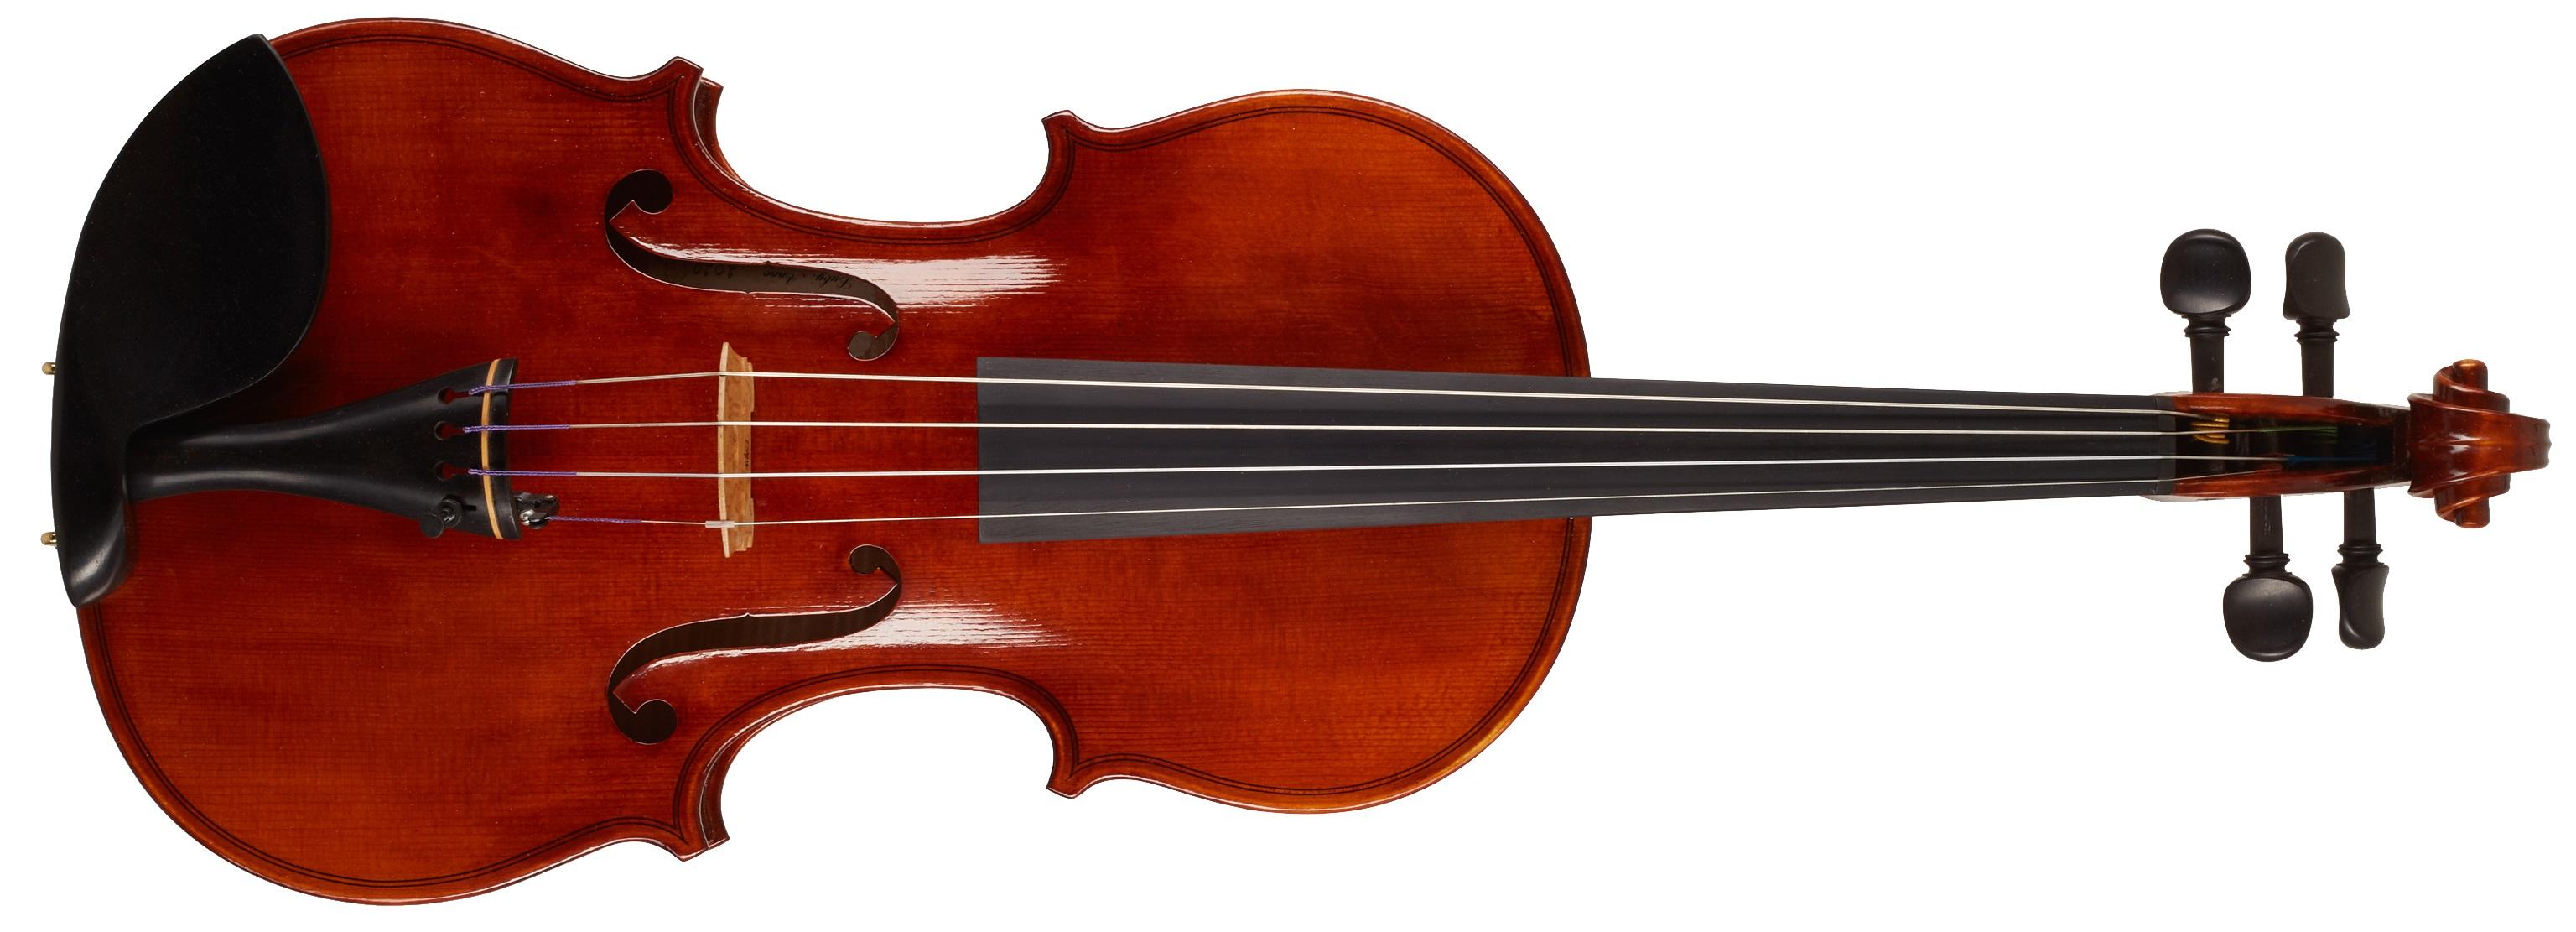 "Maestro Instrument Petr Rácz A. Stradivari ""Joachim"" anno 2020"